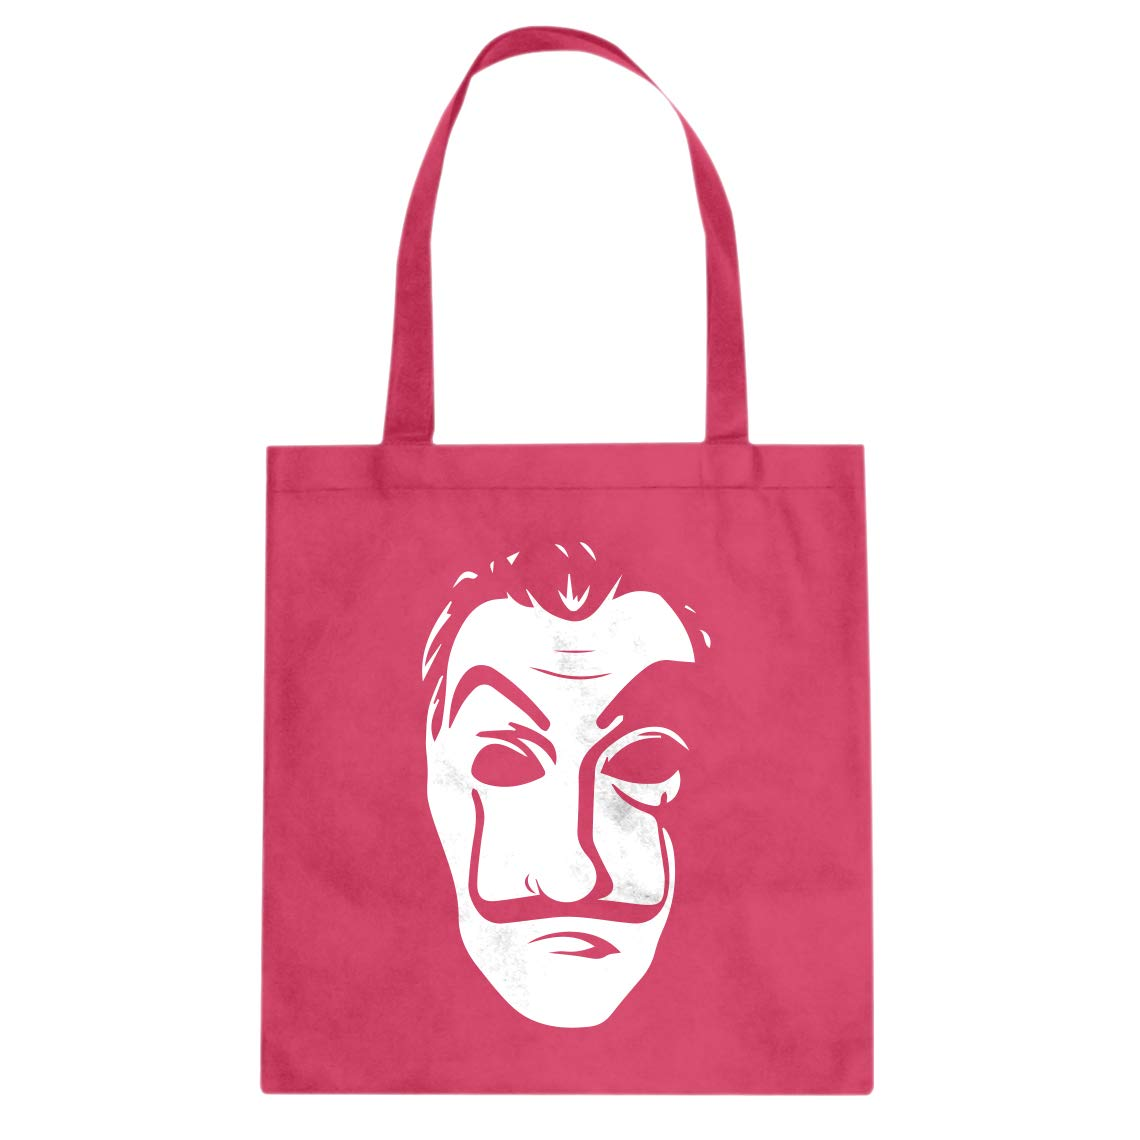 Indica Plateau Salvador Dali Face Heist Mask Cotton Canvas Tote Bag